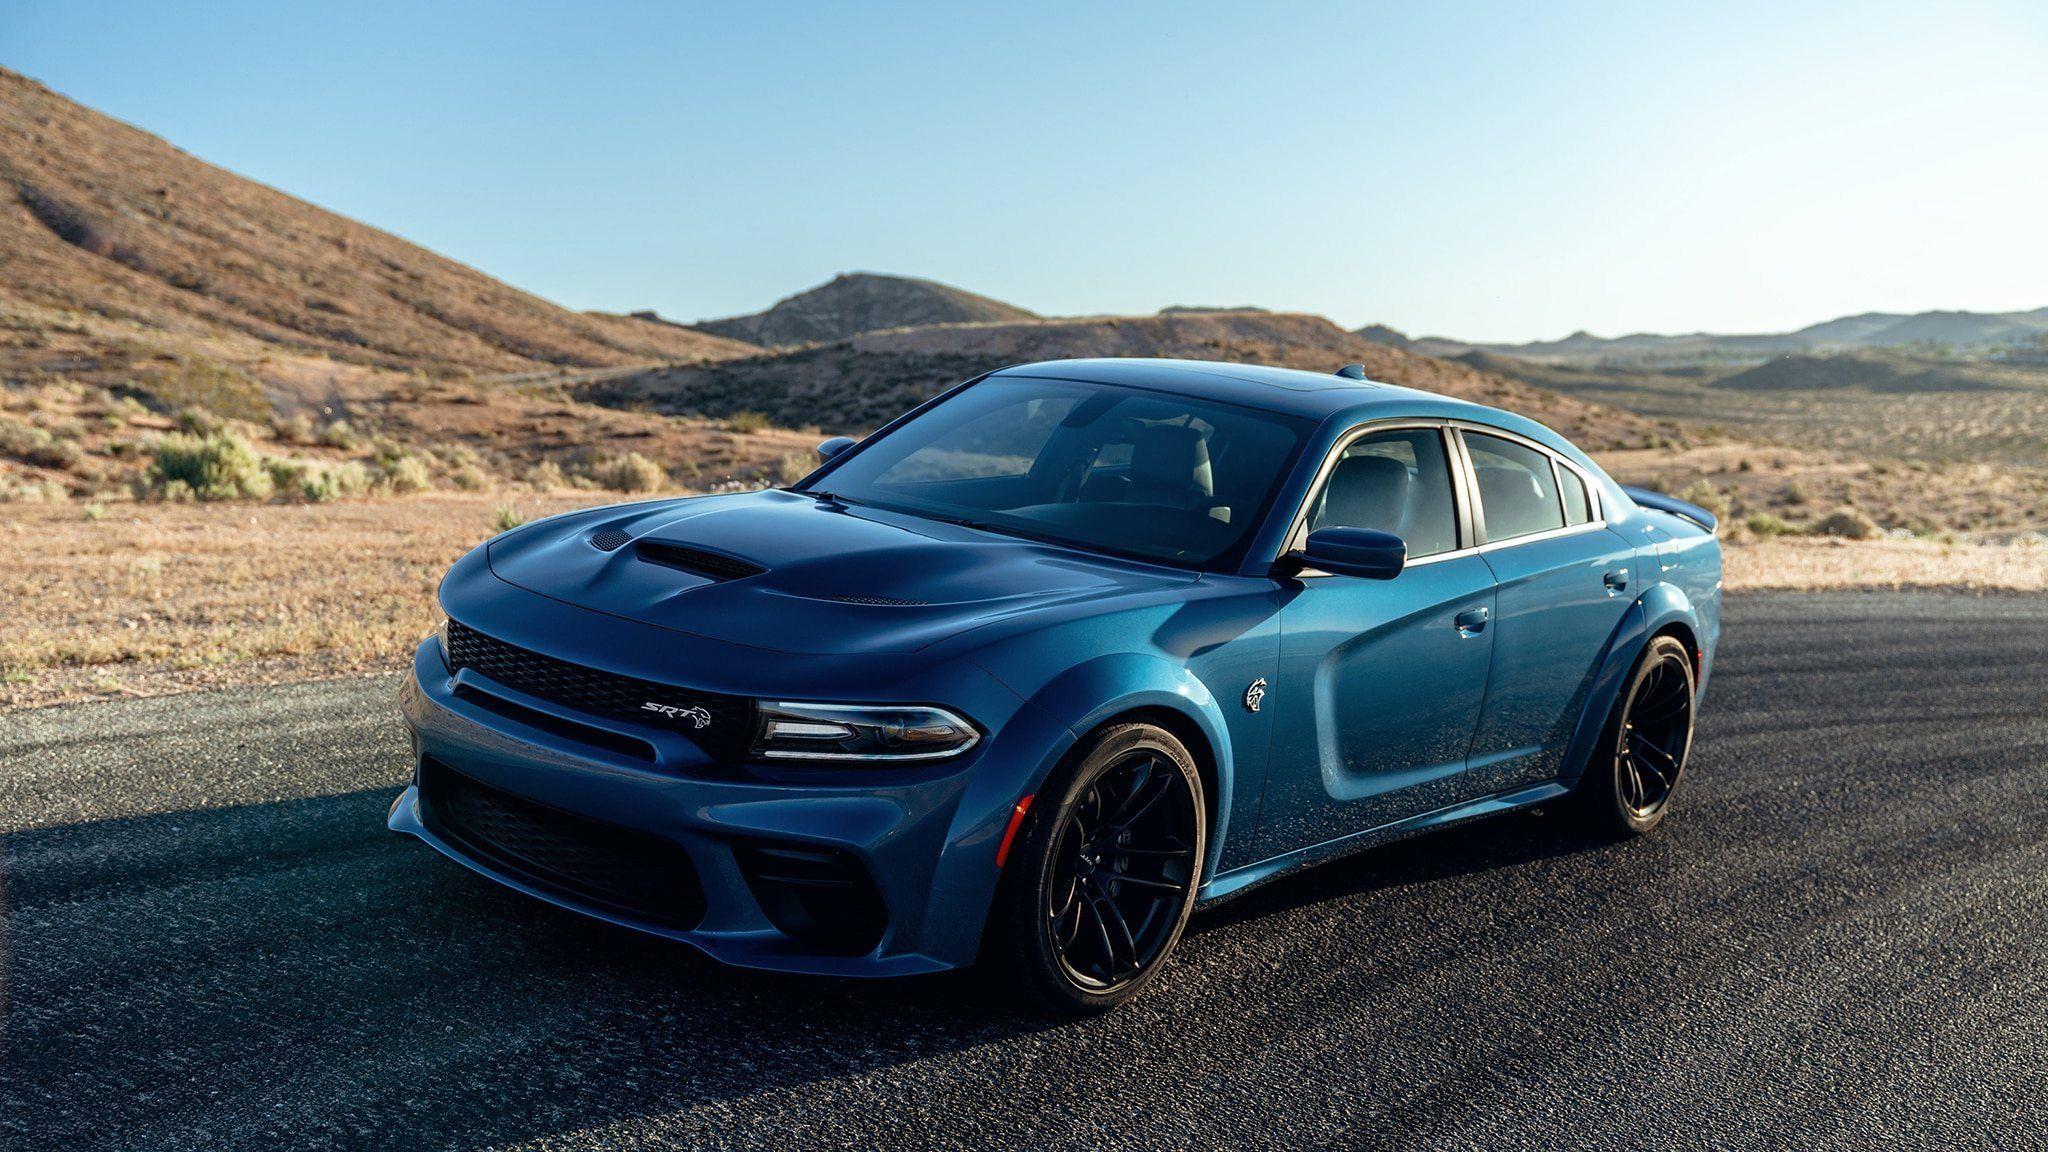 2020 Challenger Srt8 Hellcat Price Design And Review In 2020 Charger Srt Hellcat Dodge Charger Srt Charger Srt